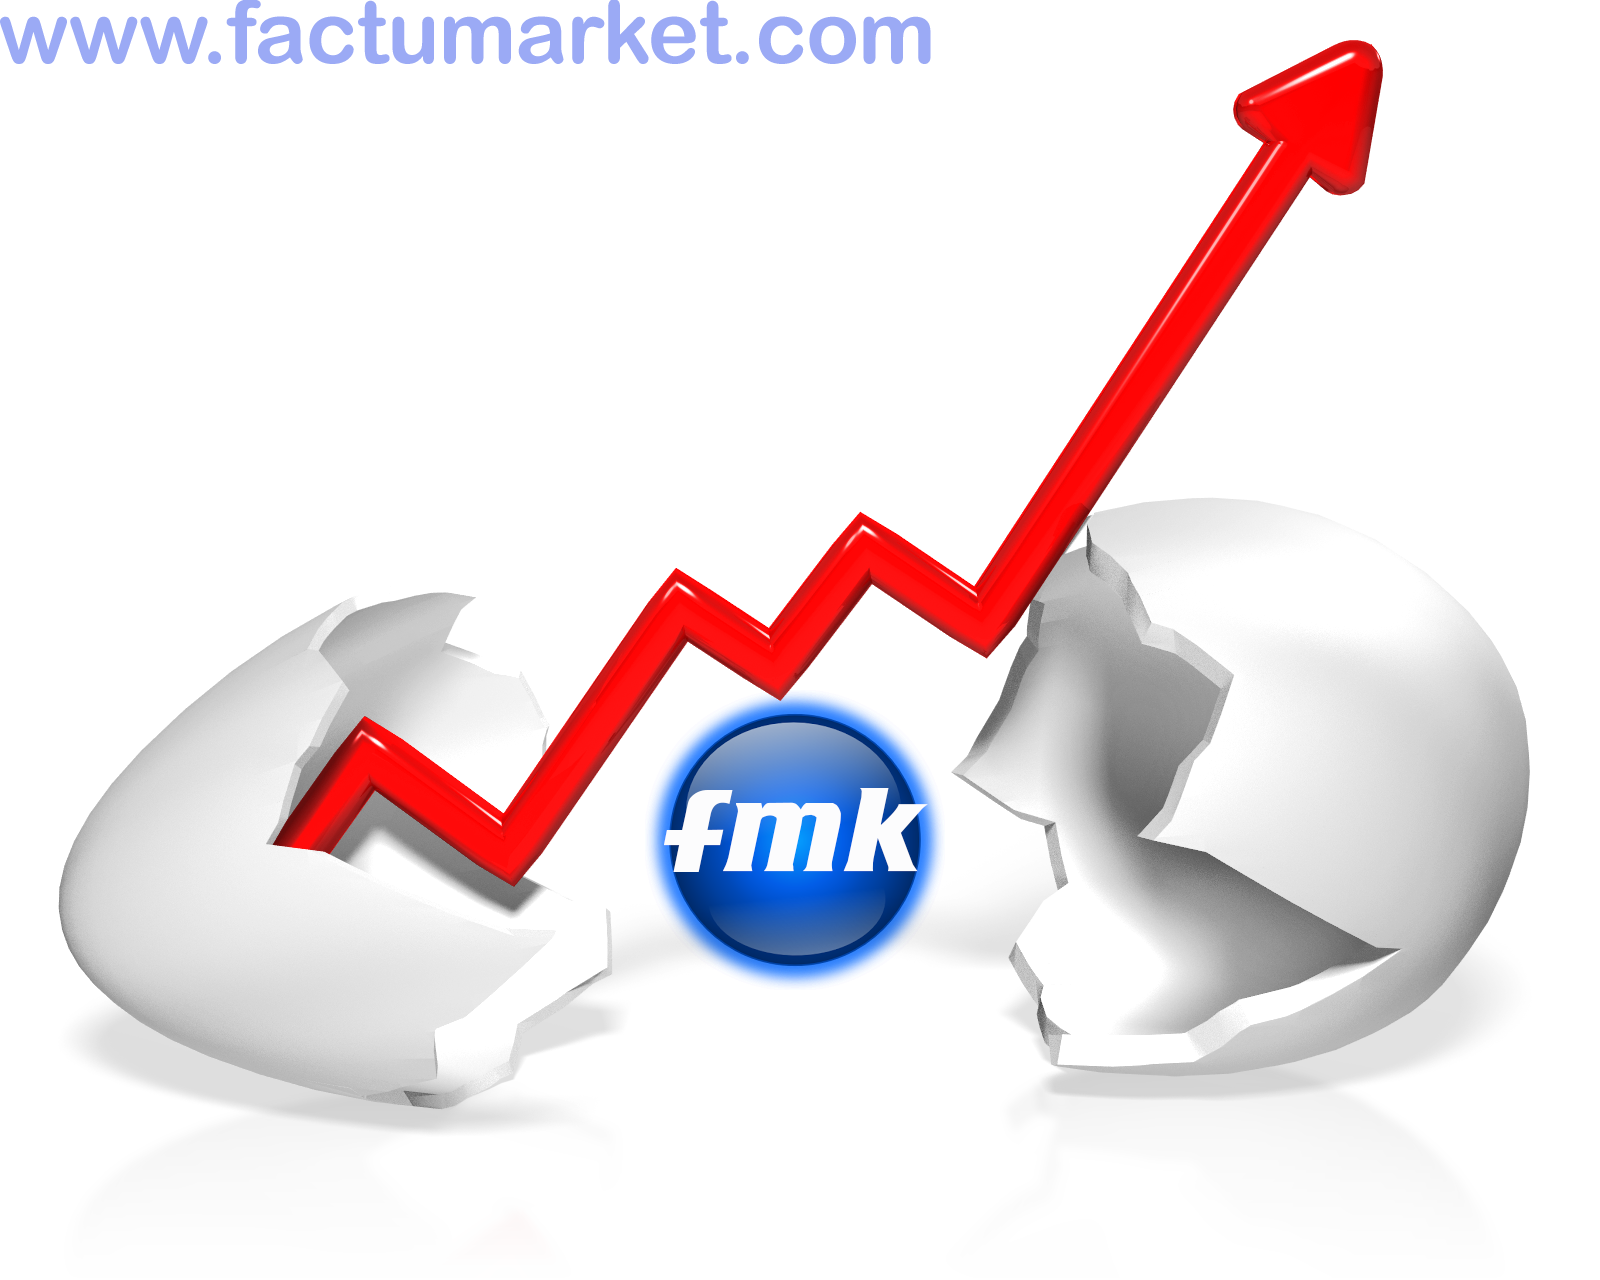 sistema_facturacion_negocios_nuevos